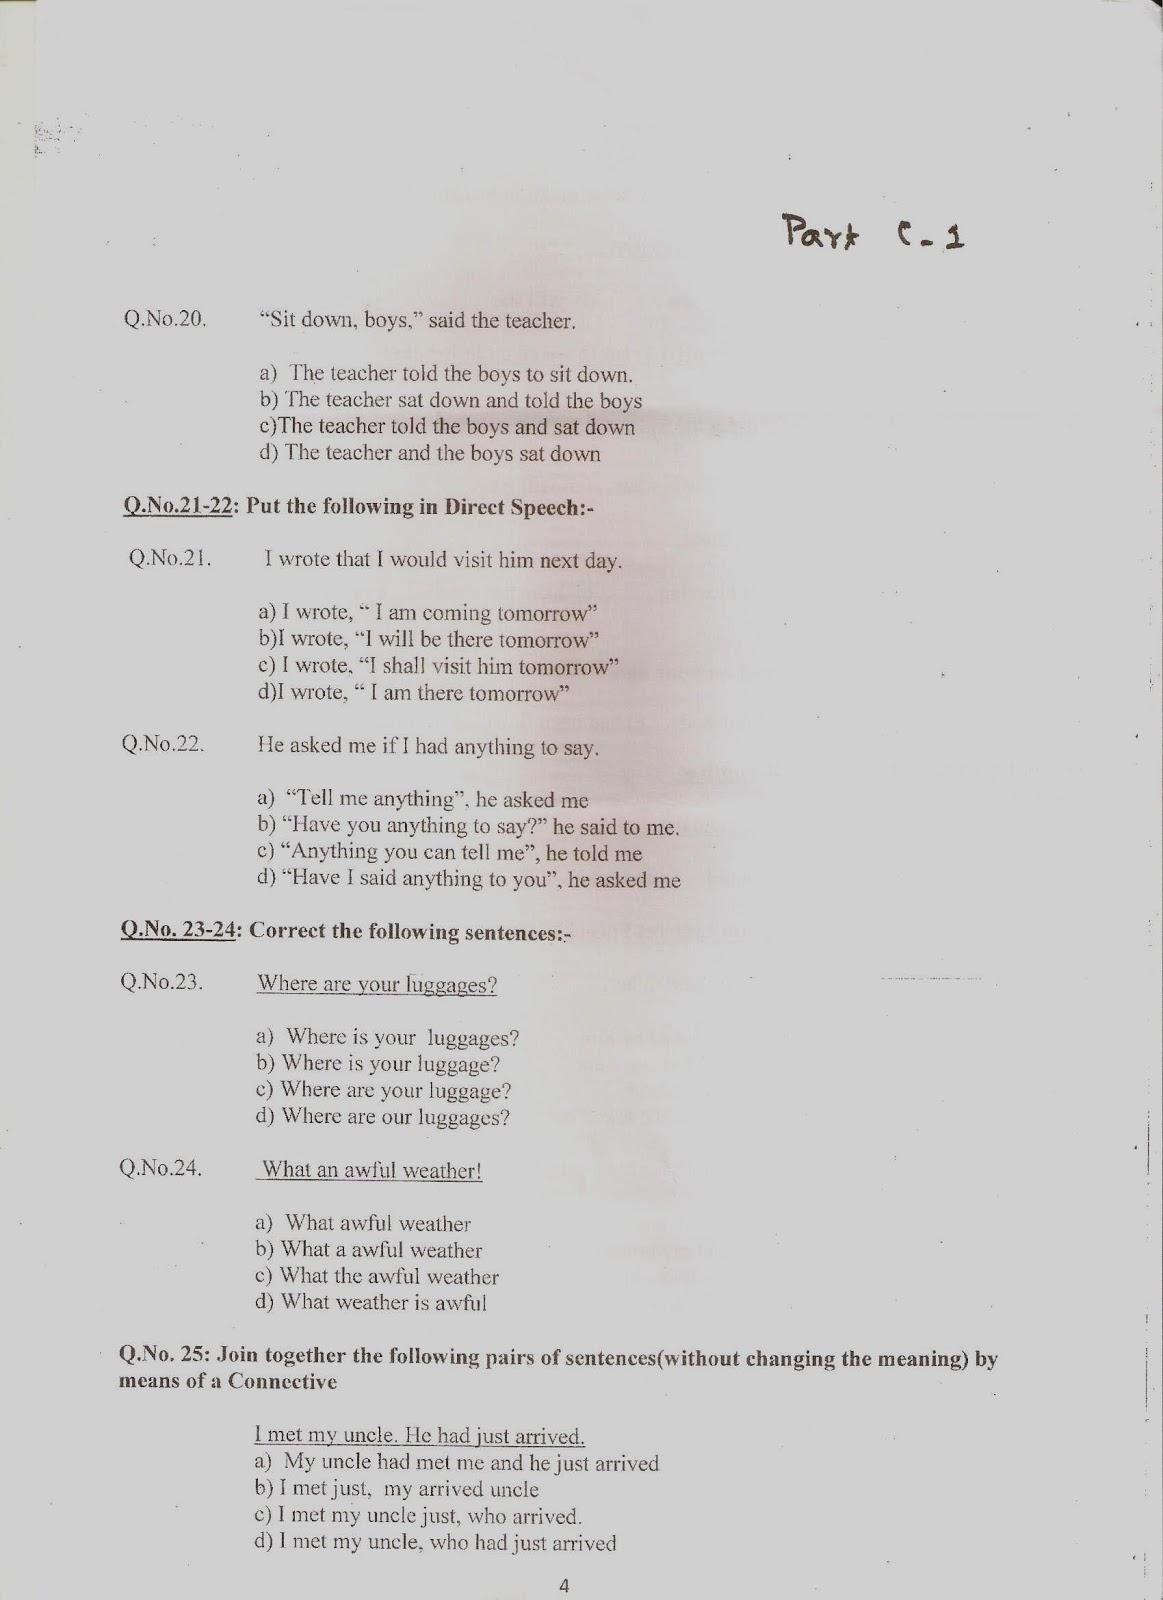 AKULA PRAVEEN KUMAR: POSTMAN EXAM PAPER- TAMILNADU CIRCLE